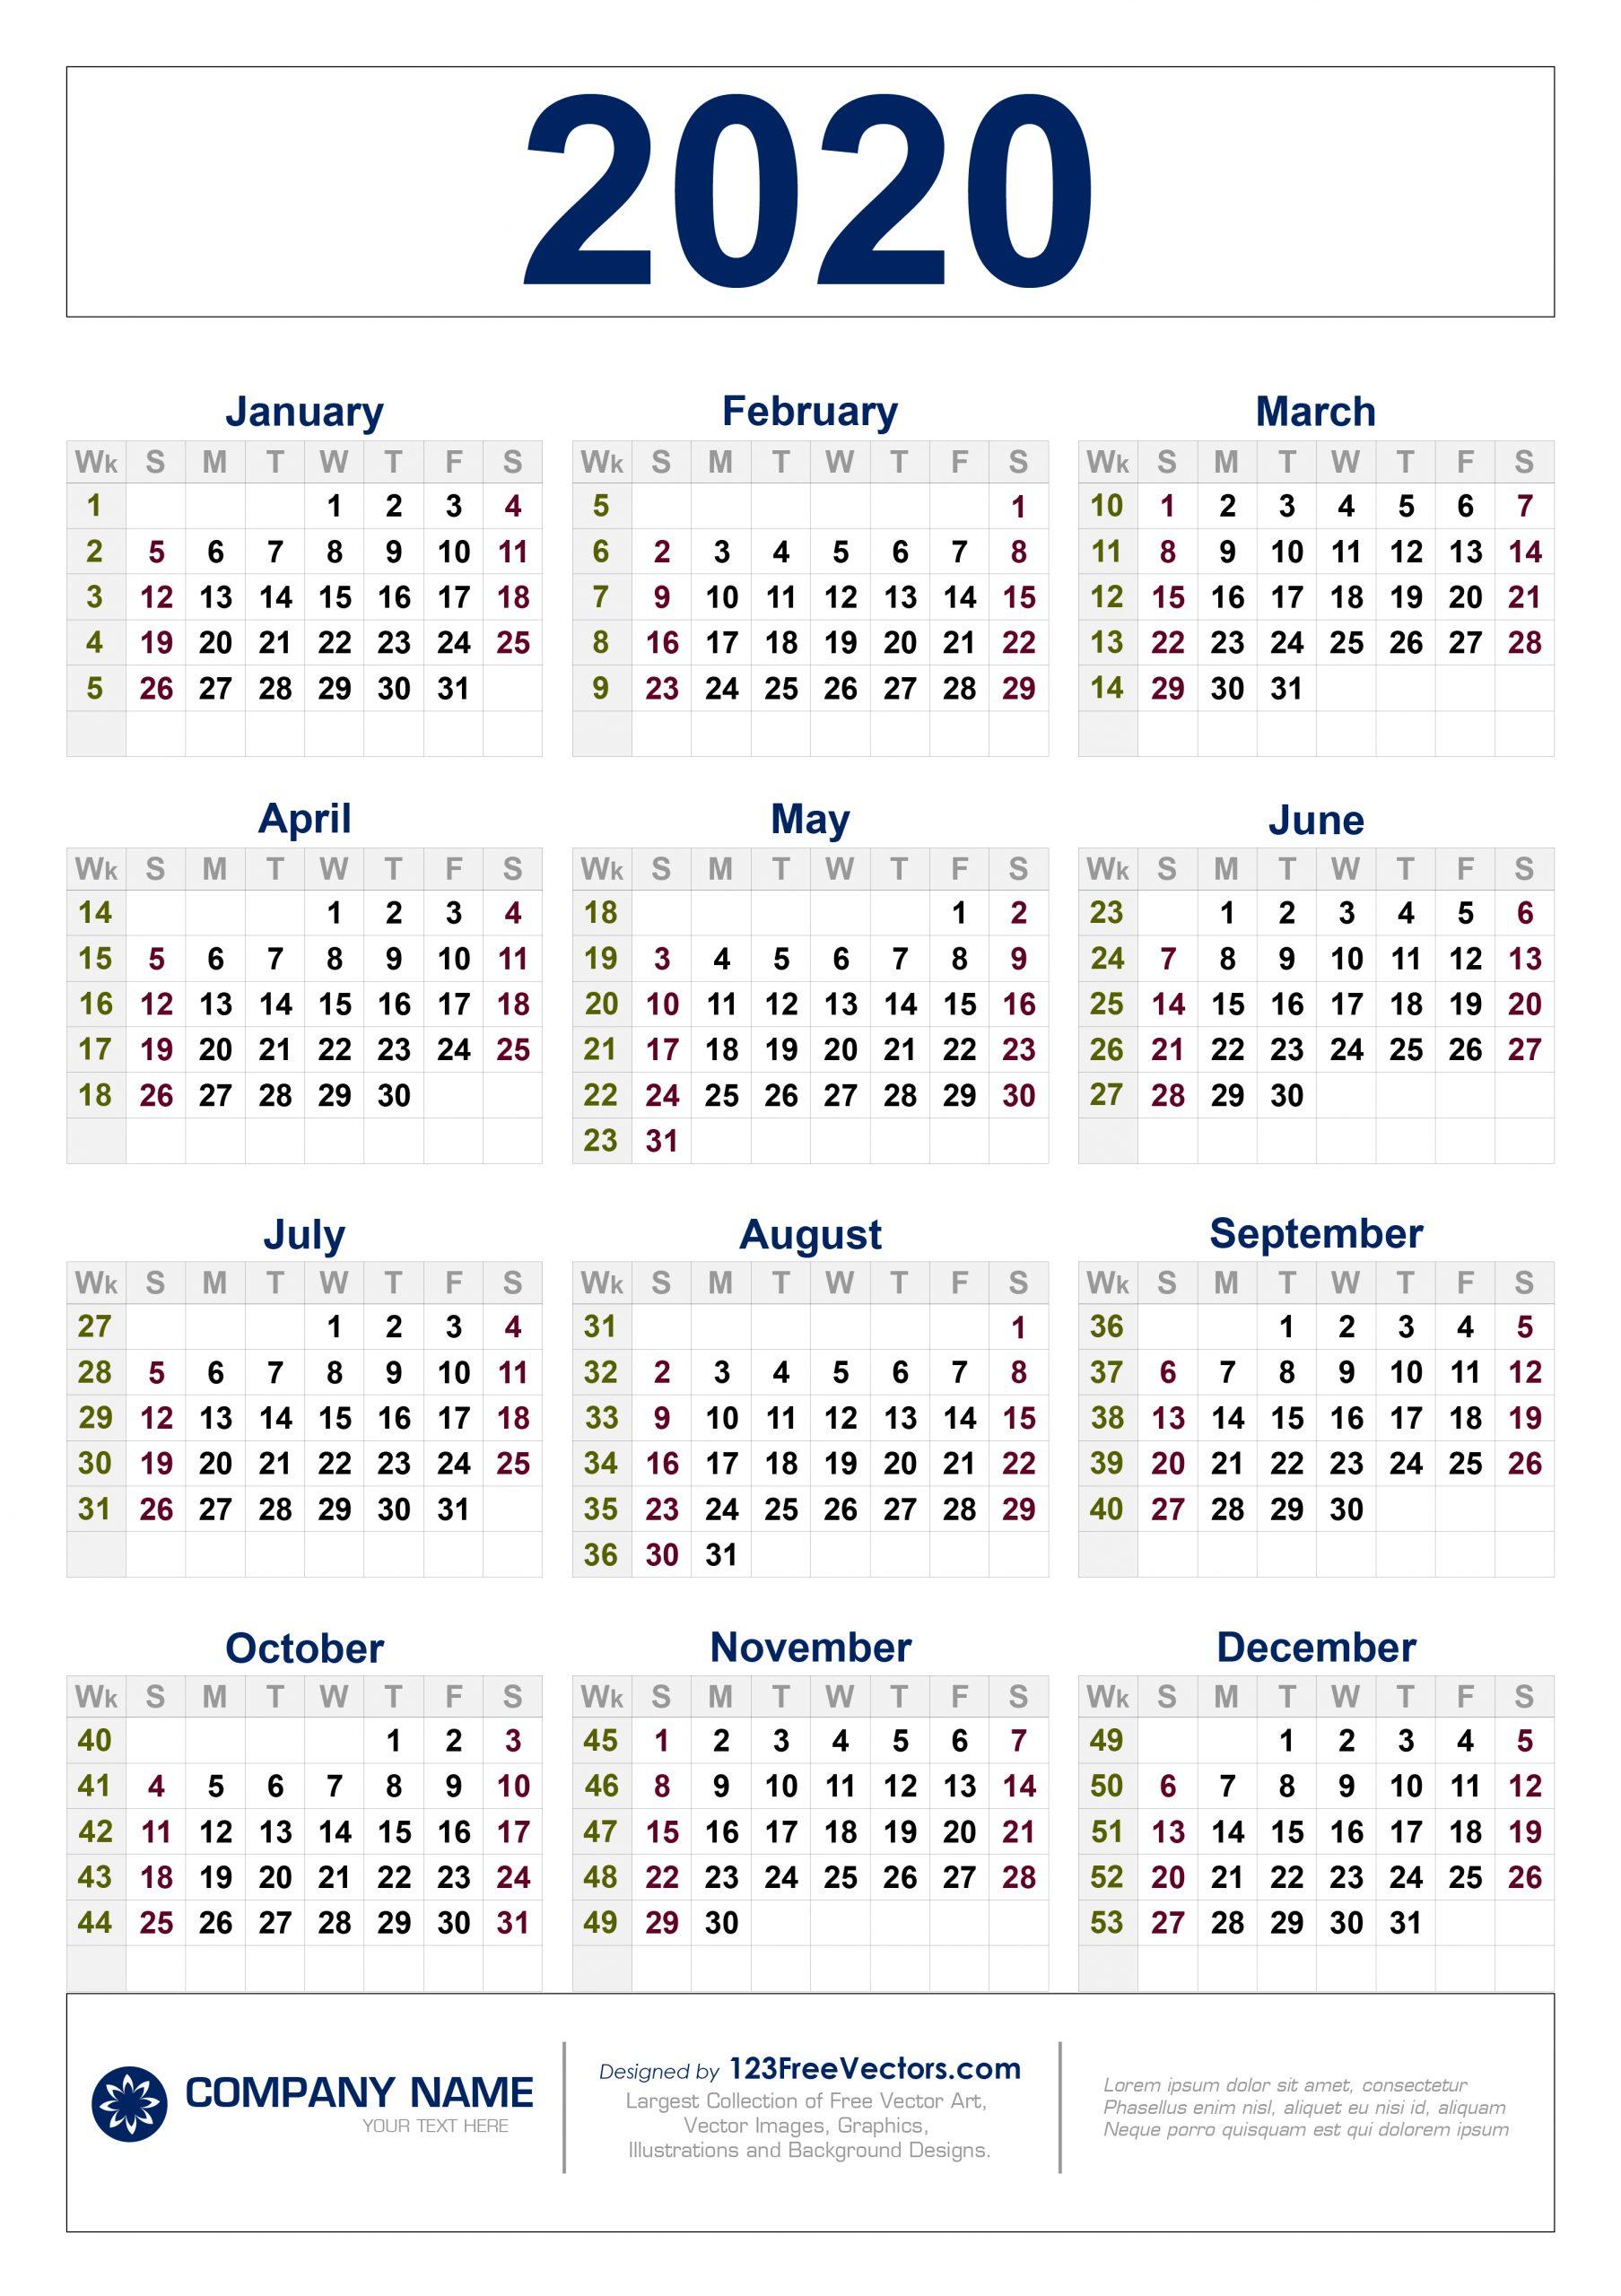 Calendar With Week Numbers 2020 - Wpa.wpart.co